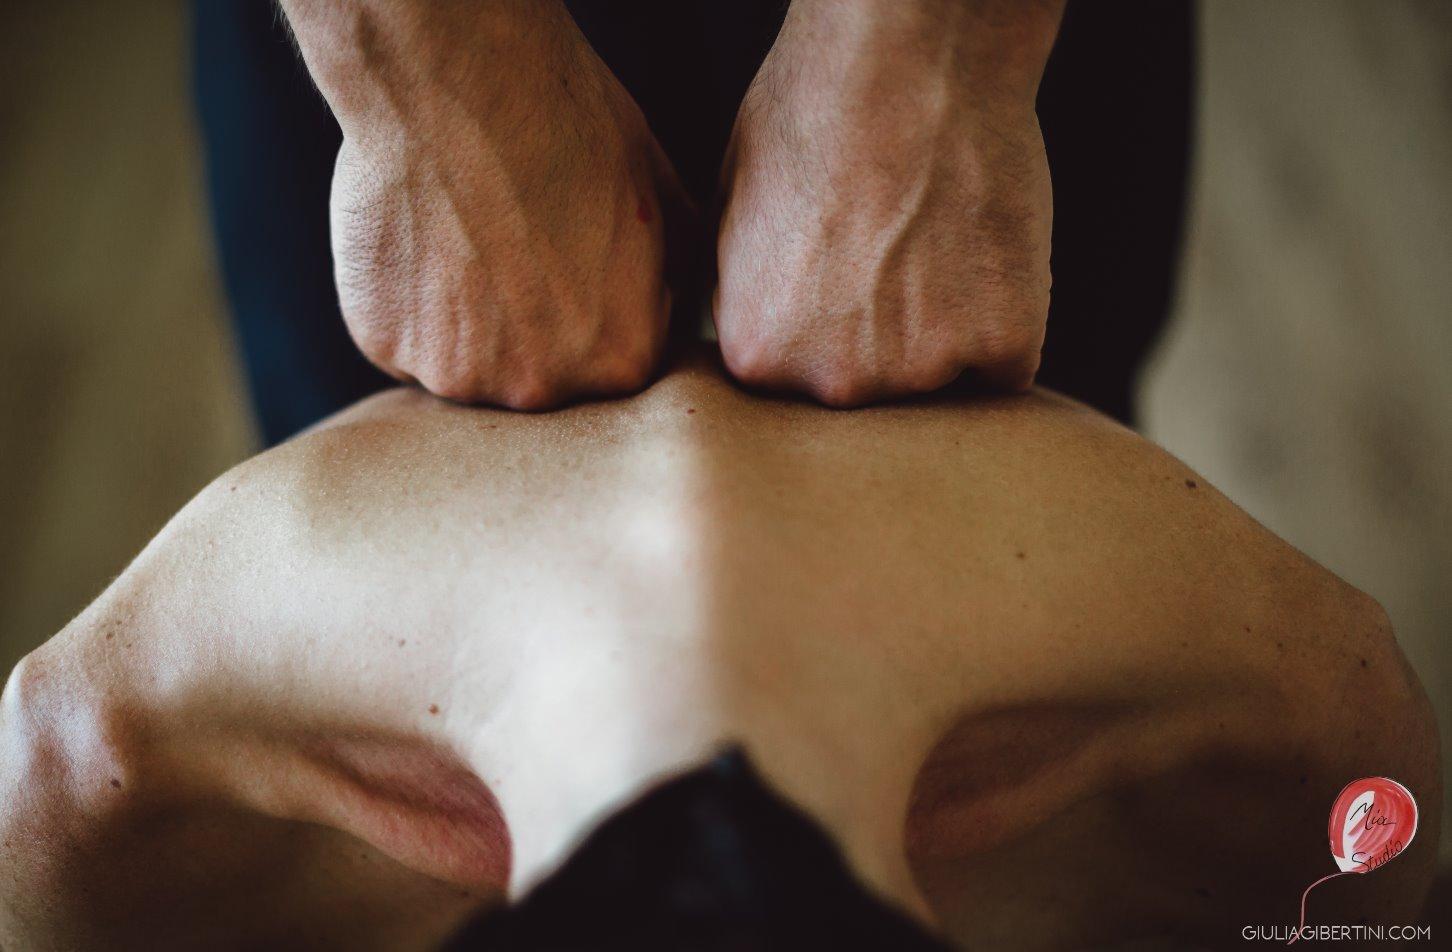 terapie manuali